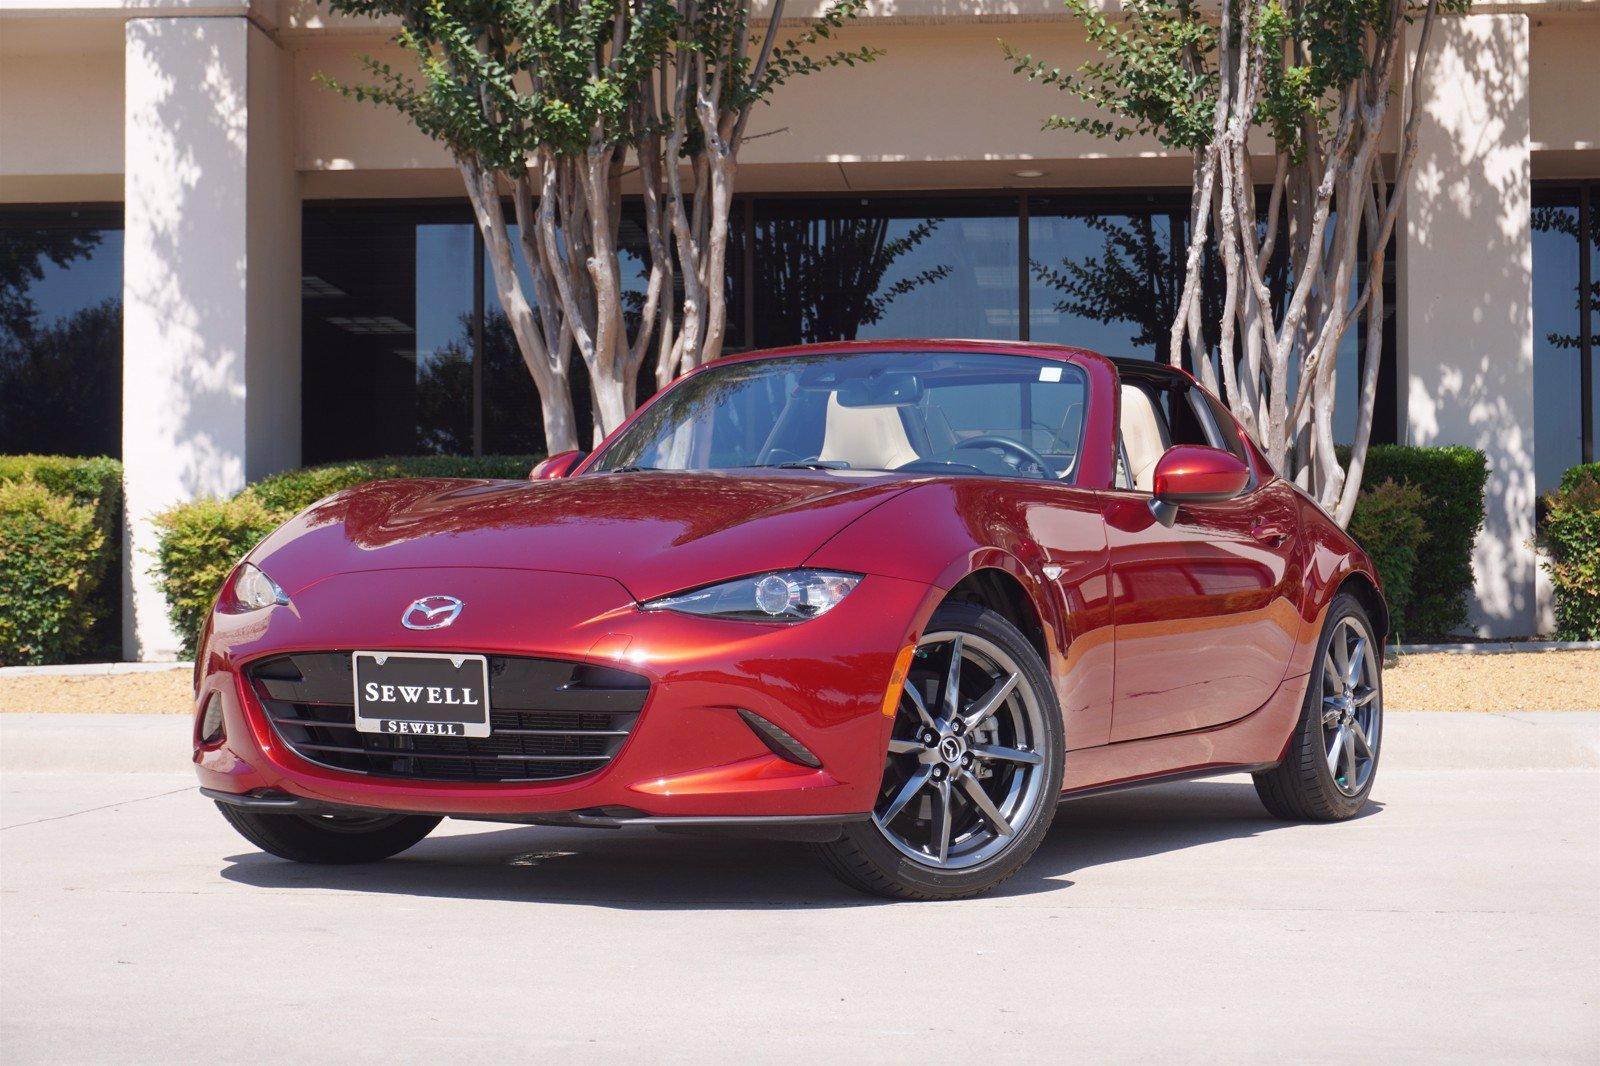 2019 Mazda MX-5 Miata RF Vehicle Photo in Grapevine, TX 76051